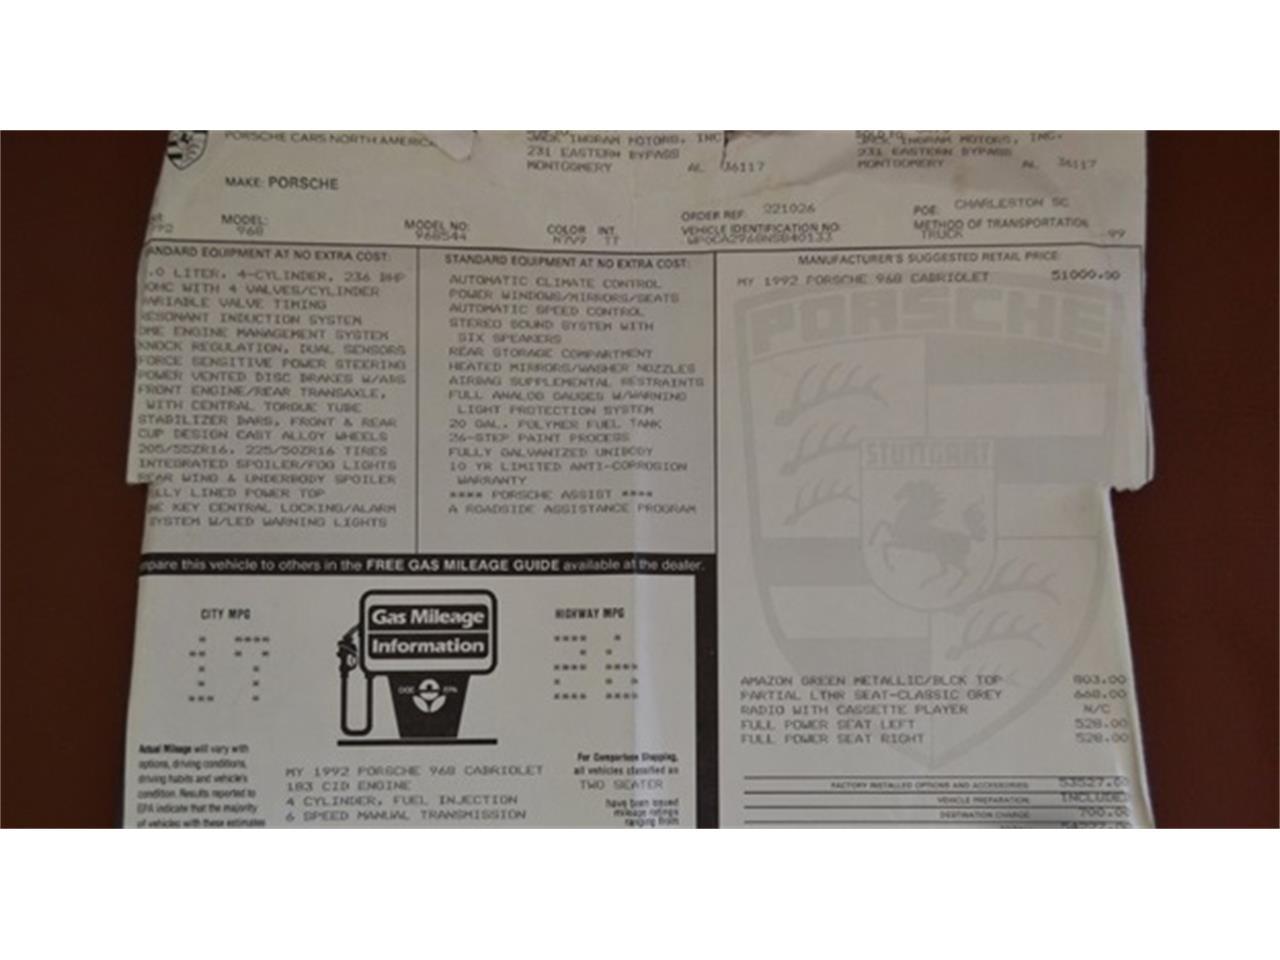 1992 Porsche 968 (CC-1300426) for sale in TAMPA, Florida